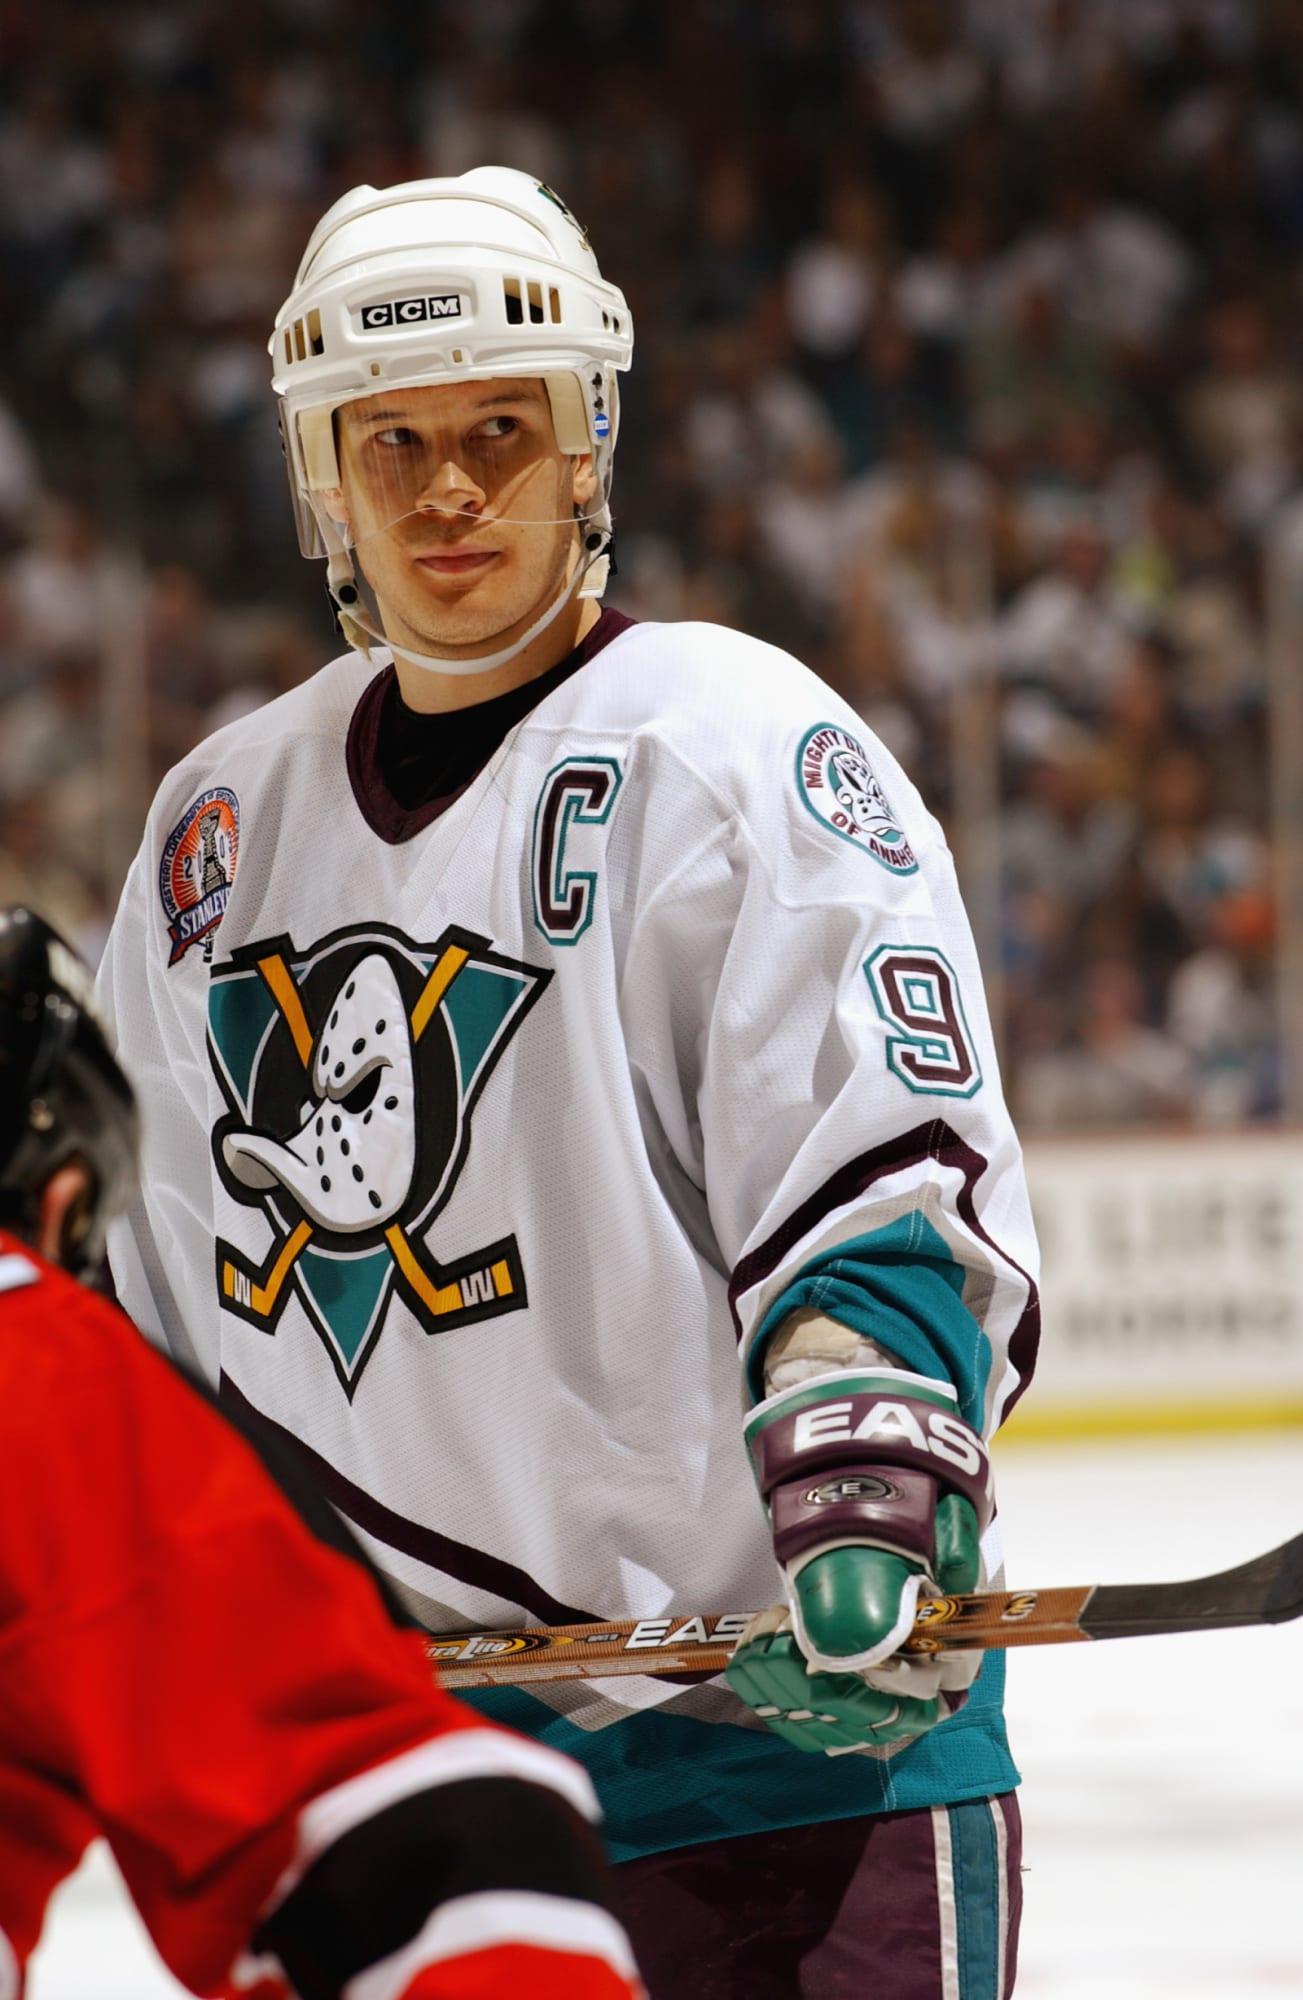 Anaheim Ducks: An Ode to the Legendary Paul Kariya